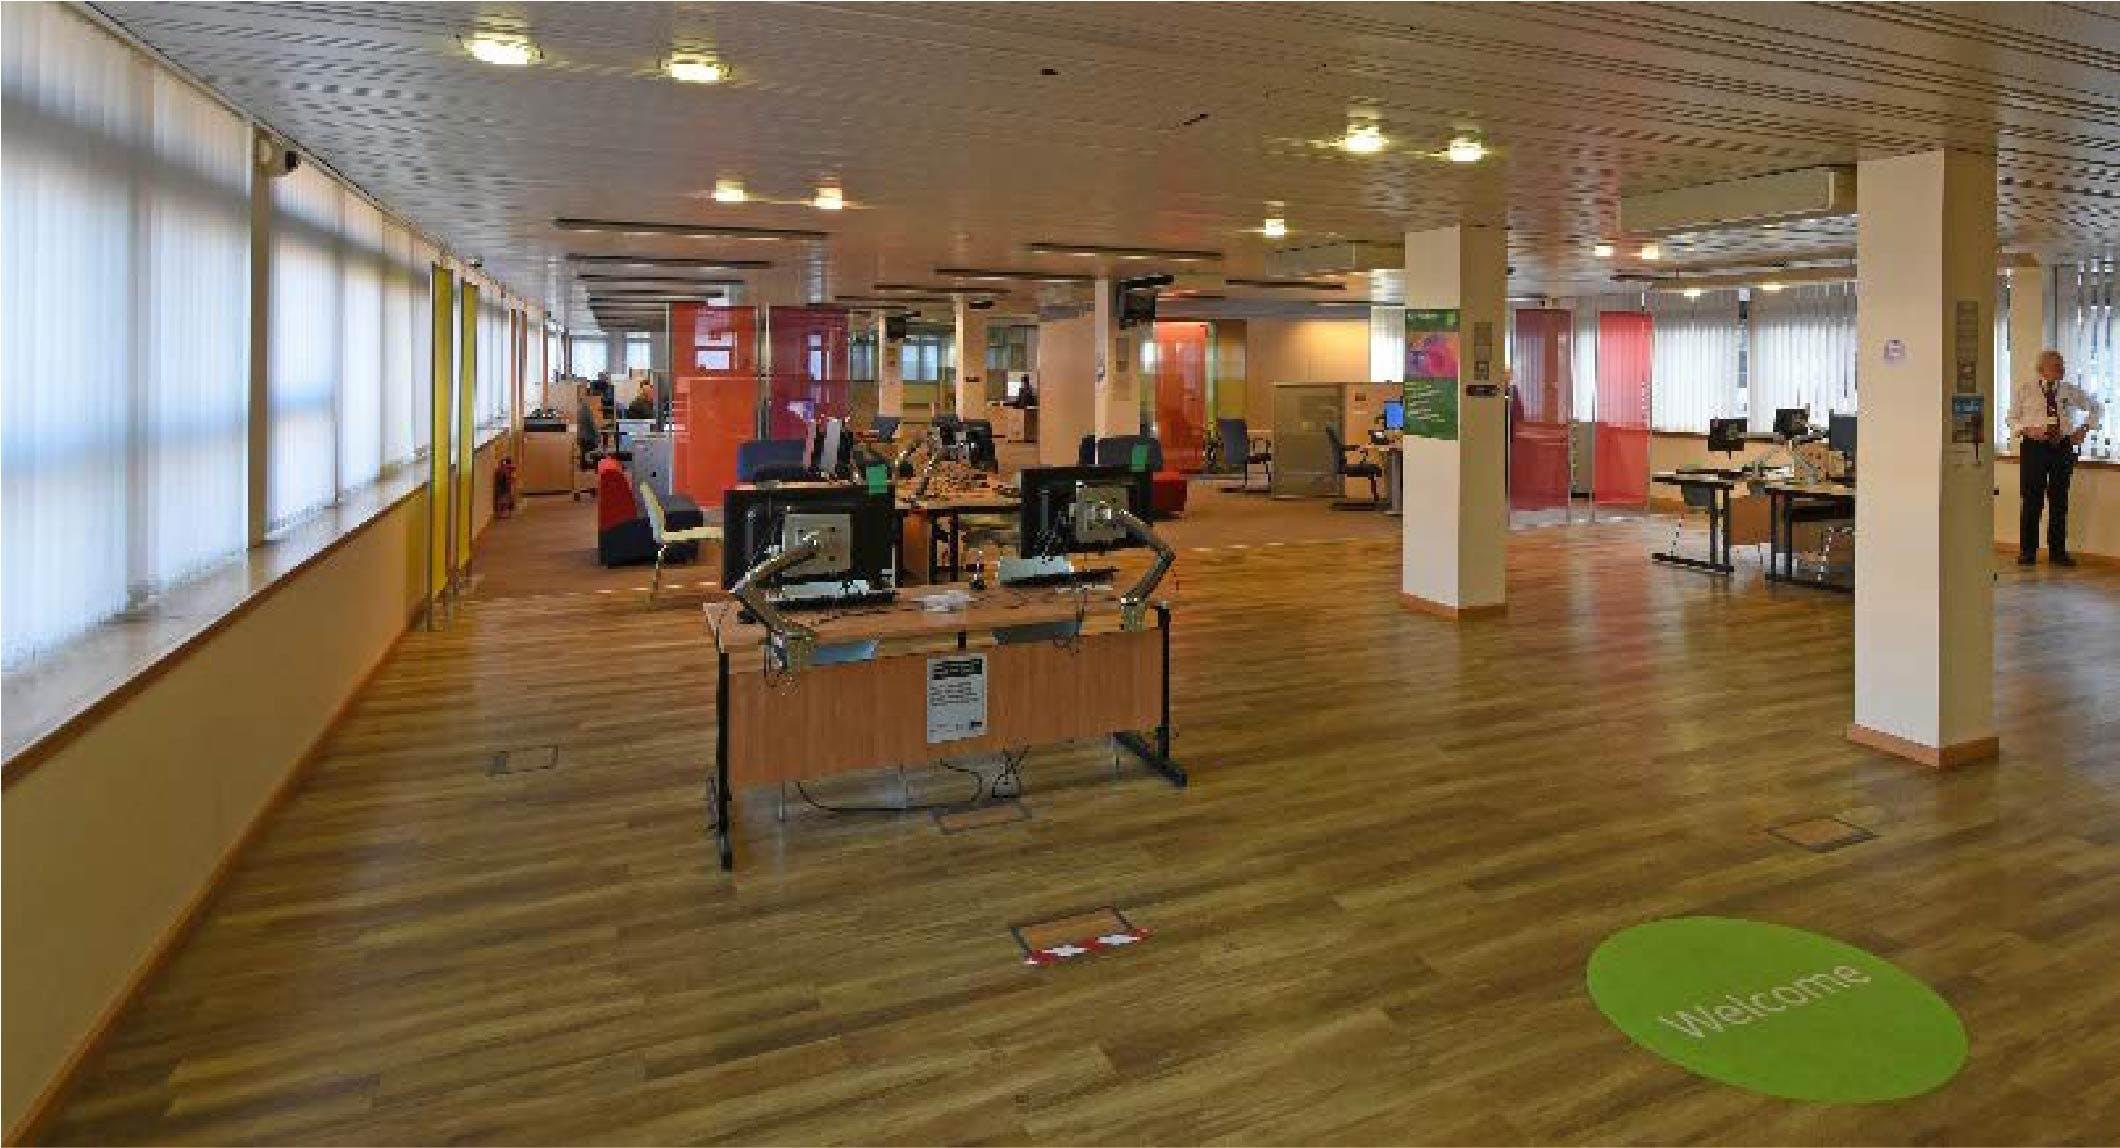 Job Centre Plus, 99-101 Dalrymple Street, Greenock, Office To Let - Greenock image 2.jpg